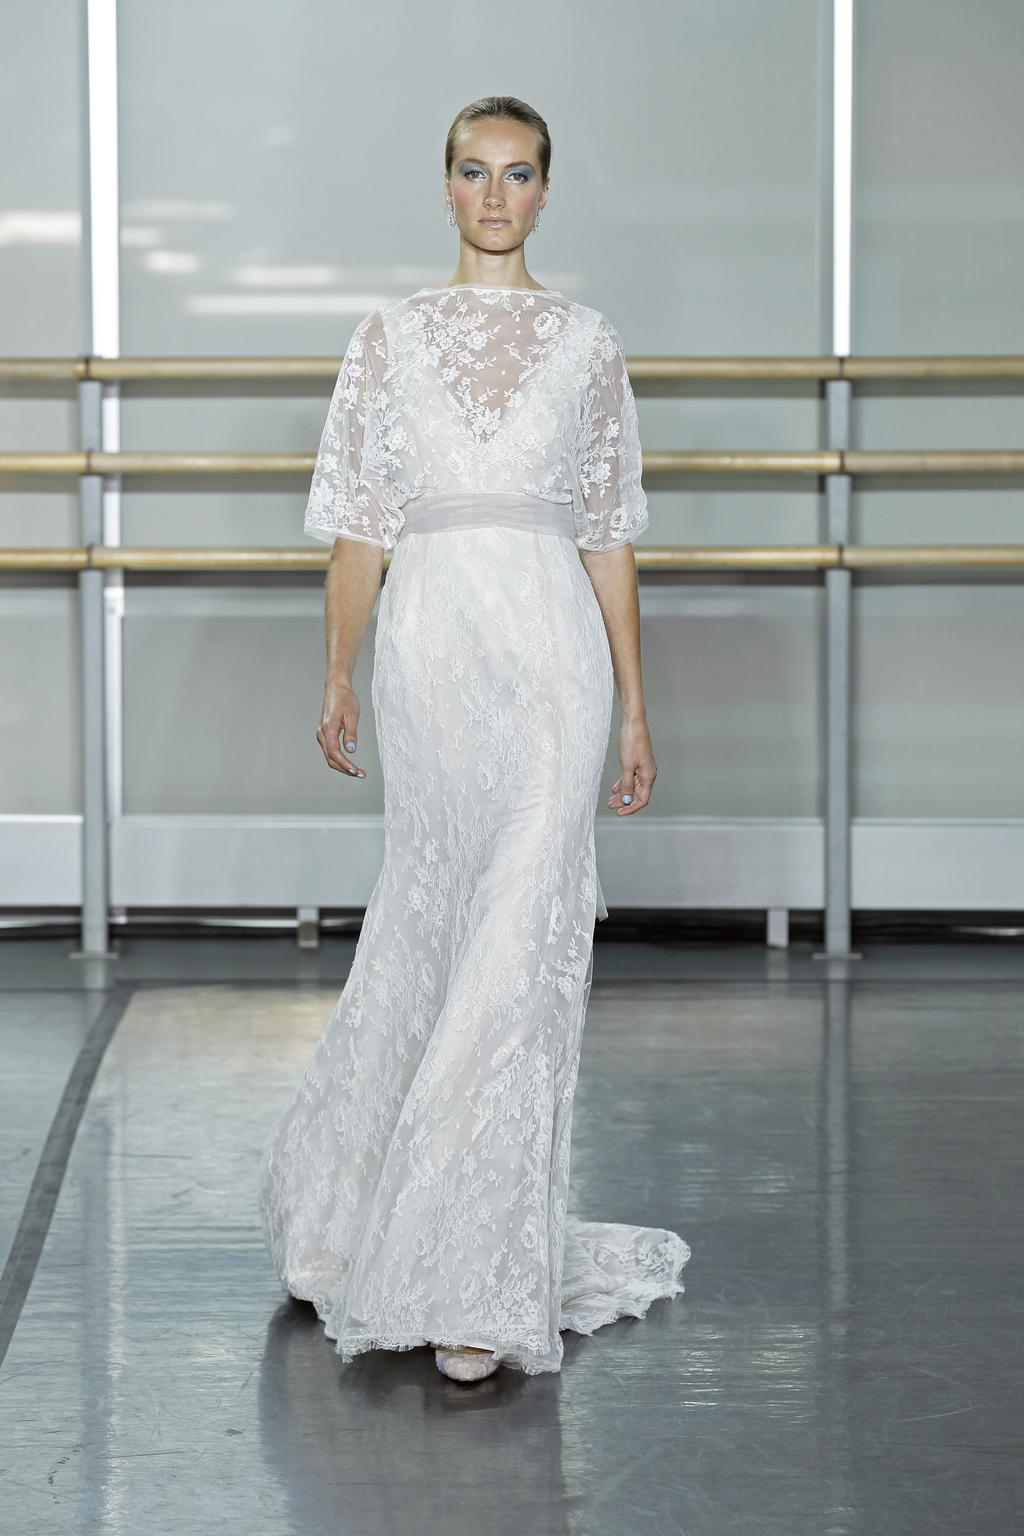 Rivini-wedding-dress-fall-2013-bridal-gown-delicata.full